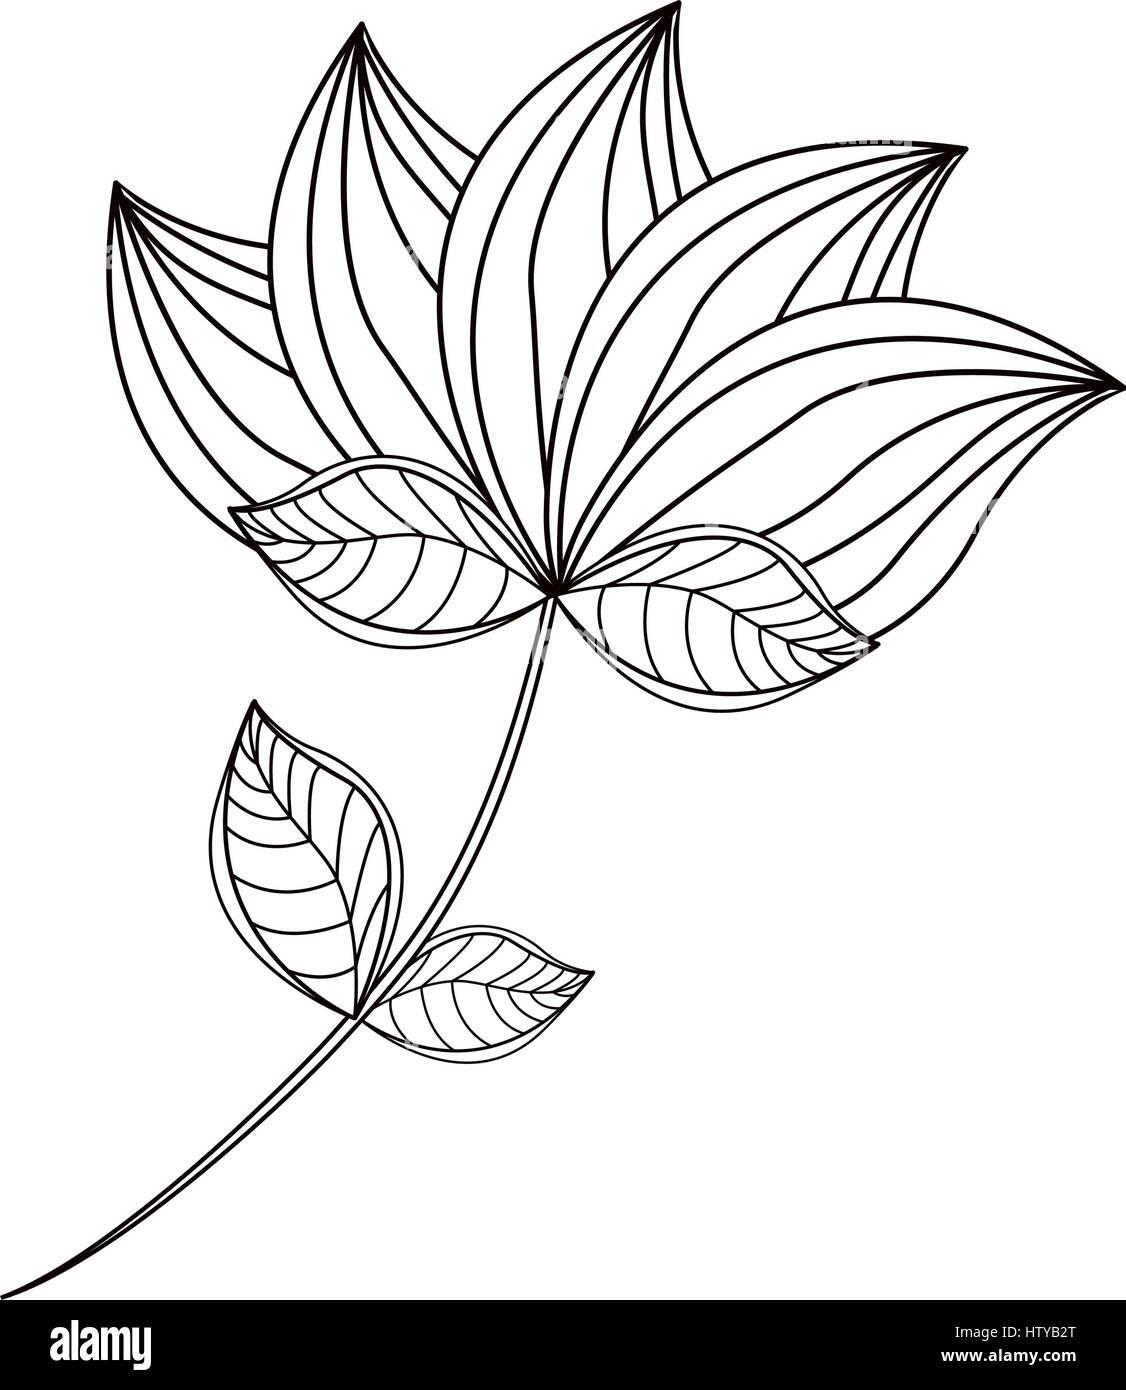 Lotus Flower Logo Creative Abstract Stock Photos Lotus Flower Logo